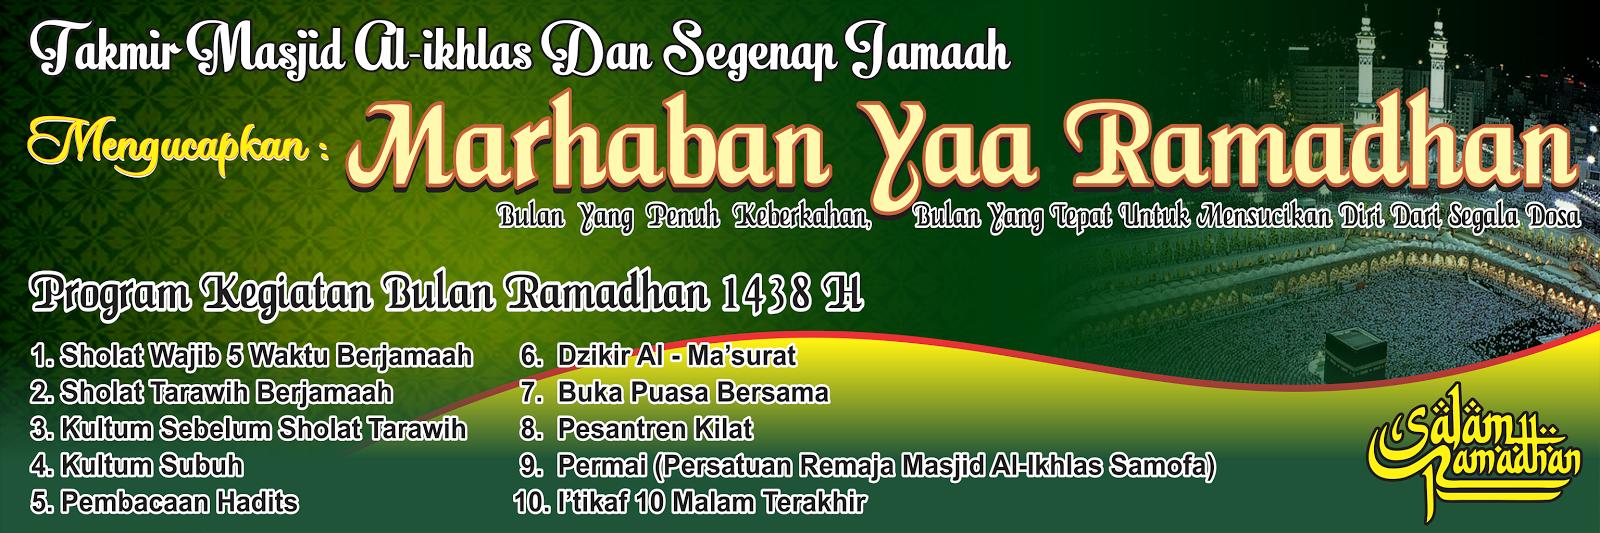 Download Spanduk Marhaban 1438 H Format Cdr Coreldraw